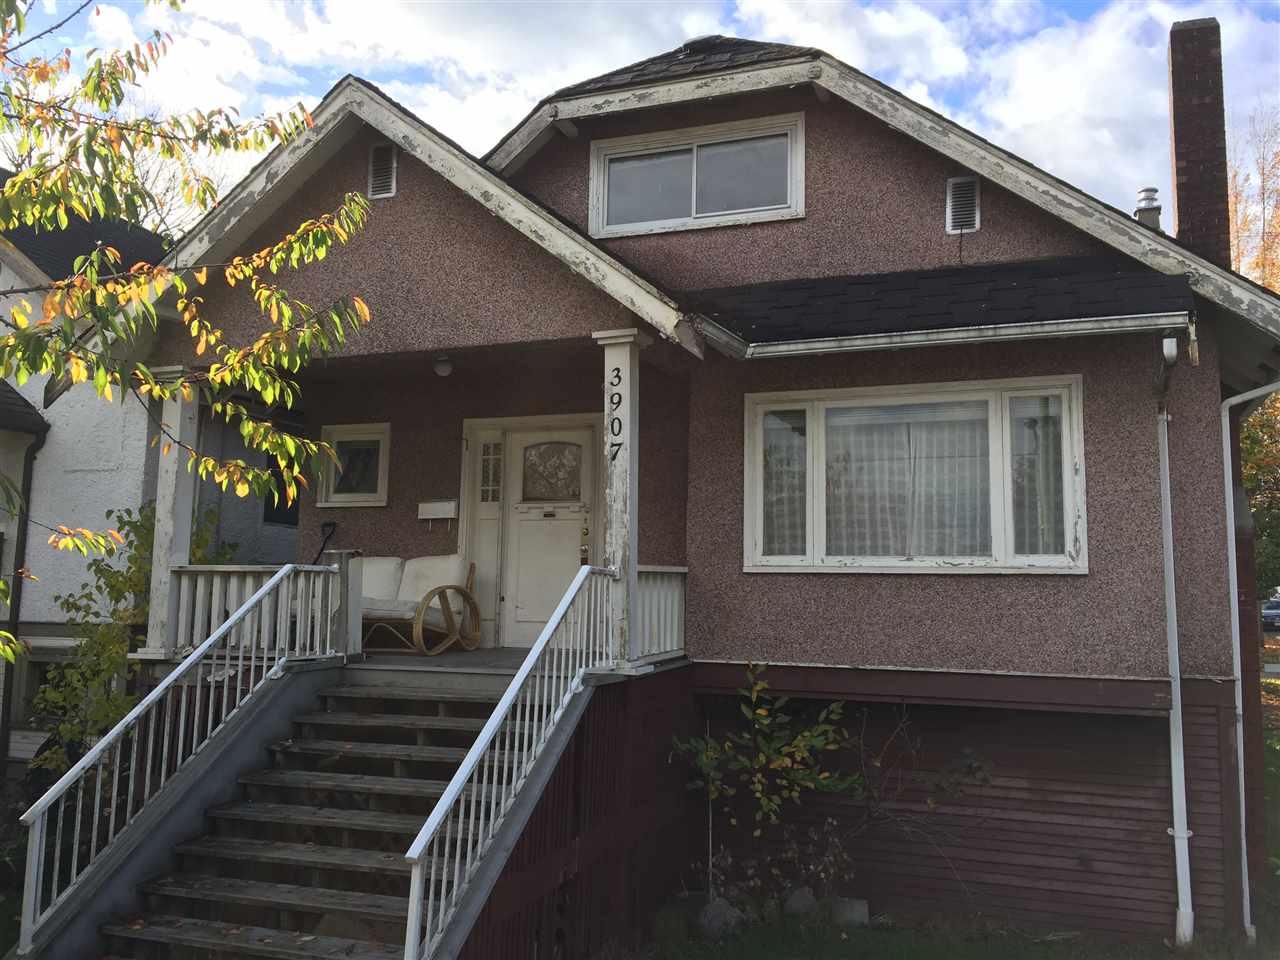 3907 DUNBAR STREET - Dunbar - Vancouver